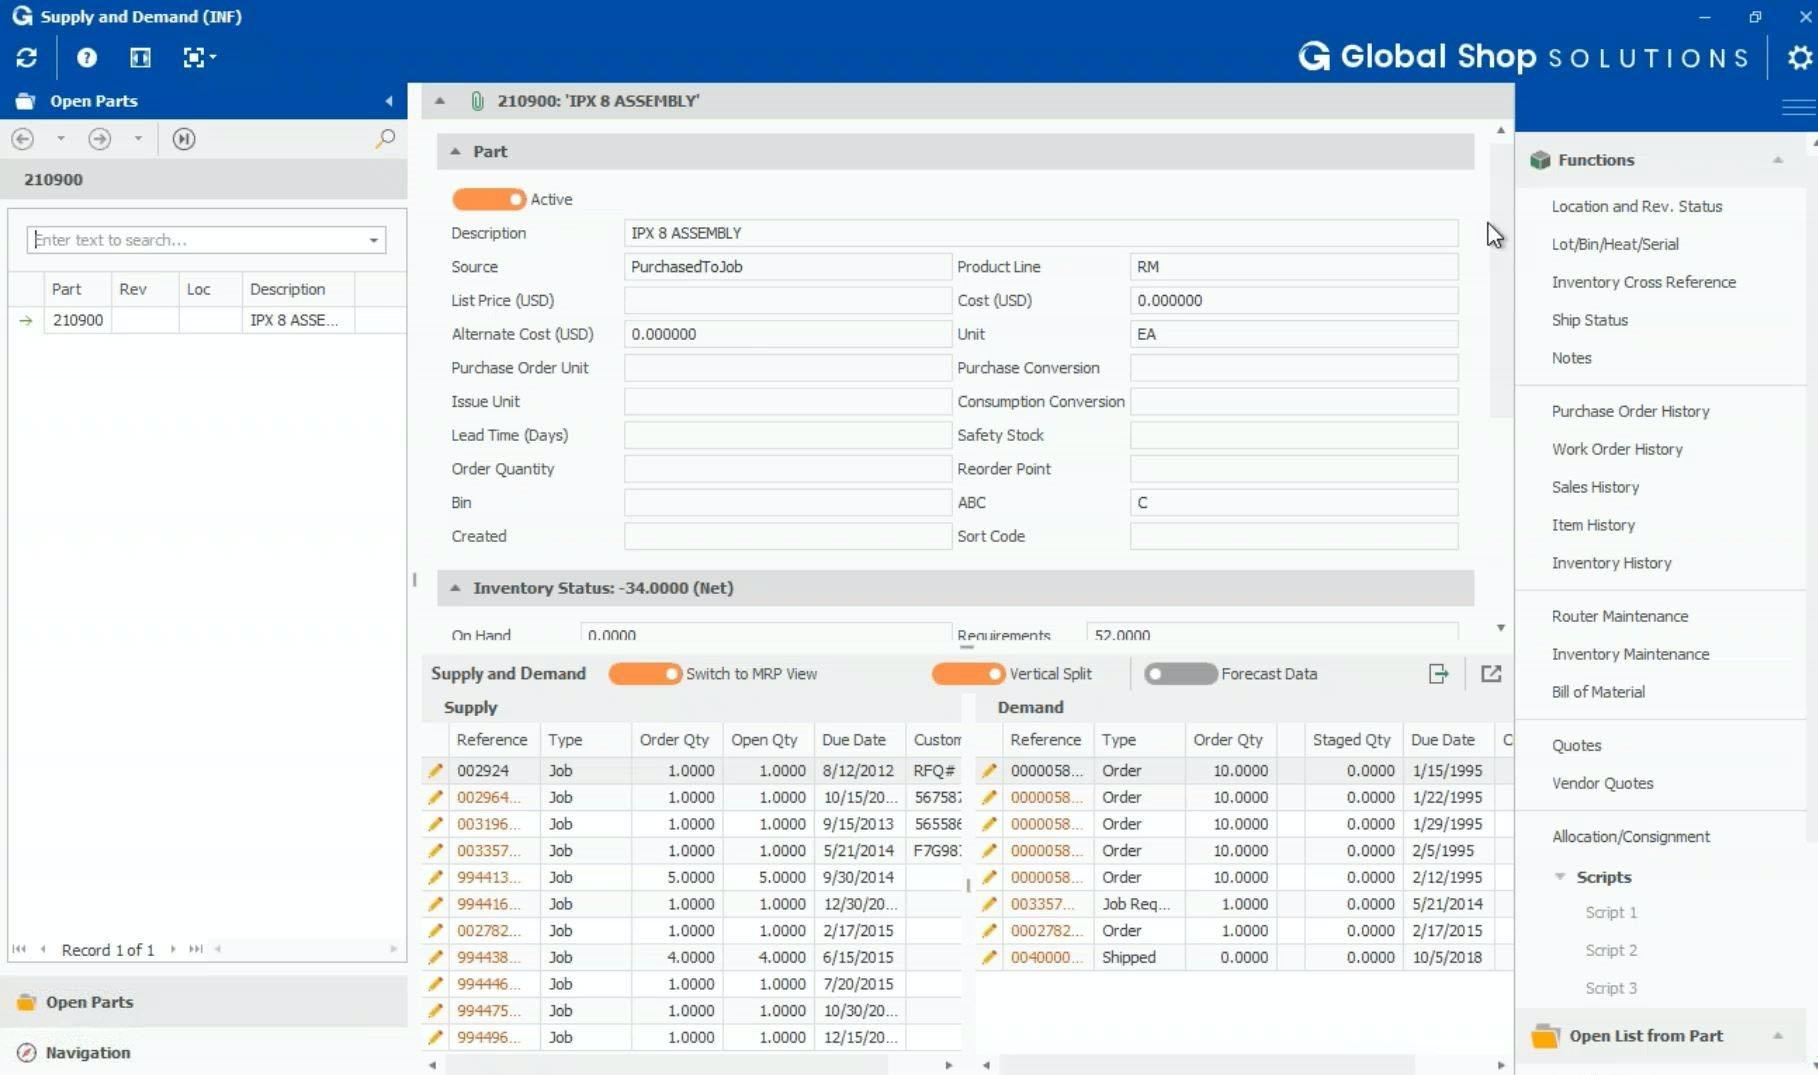 Global Shop Solutions Supply & Demand Screen